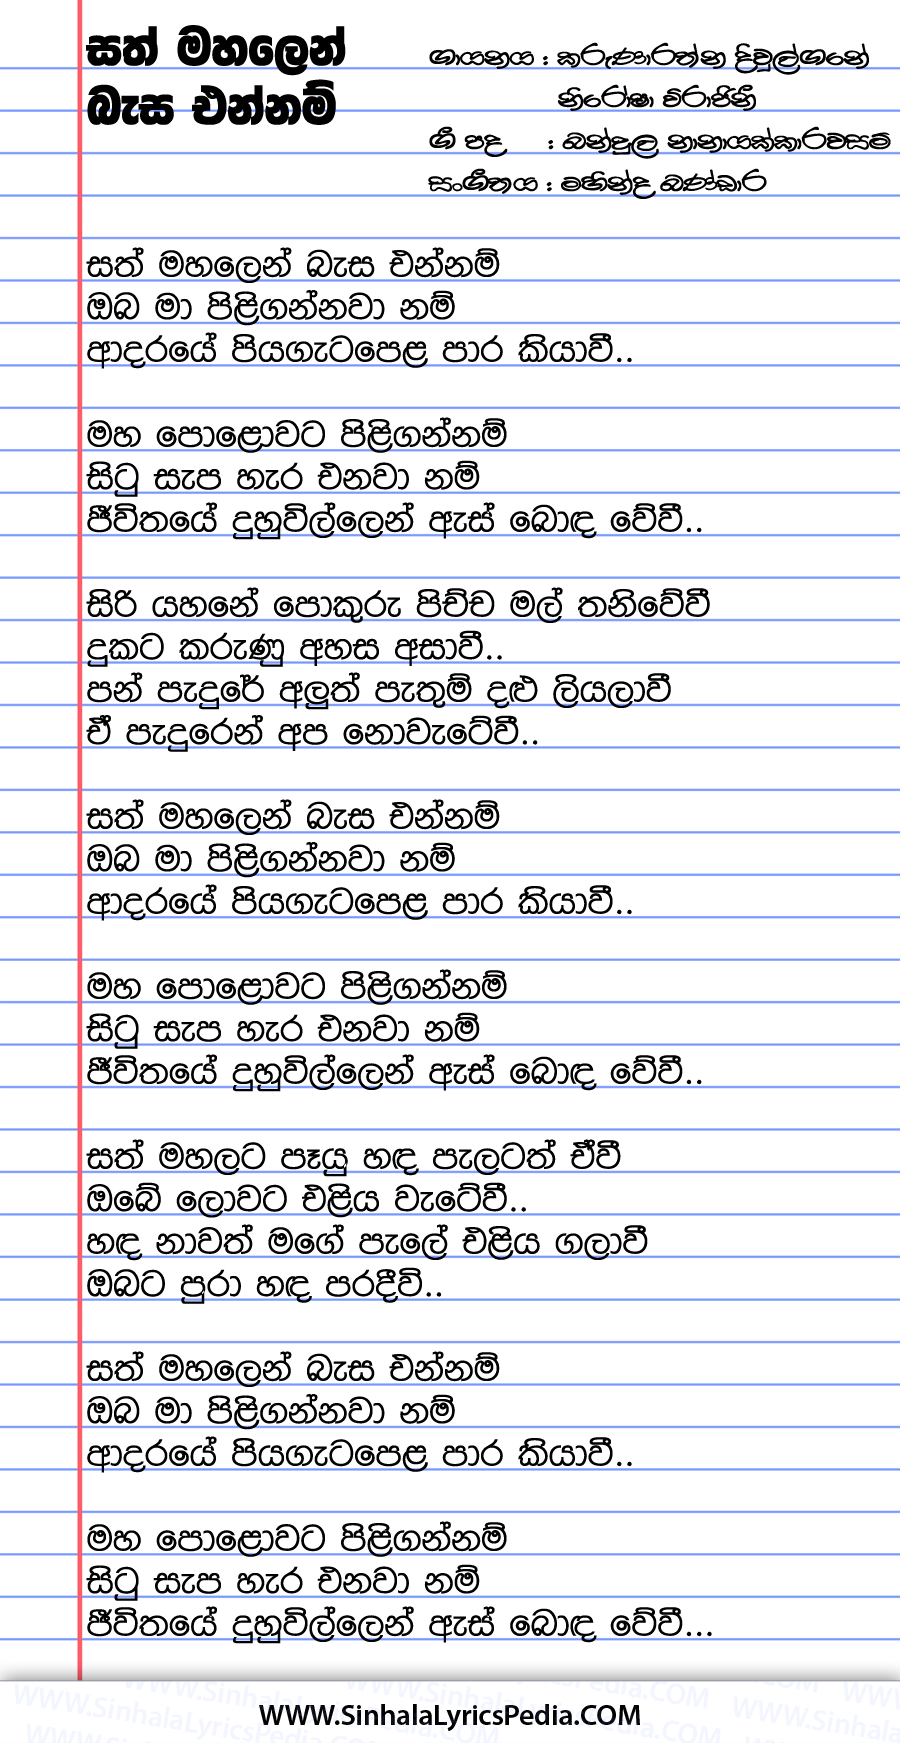 Sath Mahalin Basa Ennam Oba Ma Piligannawanam Song Lyrics